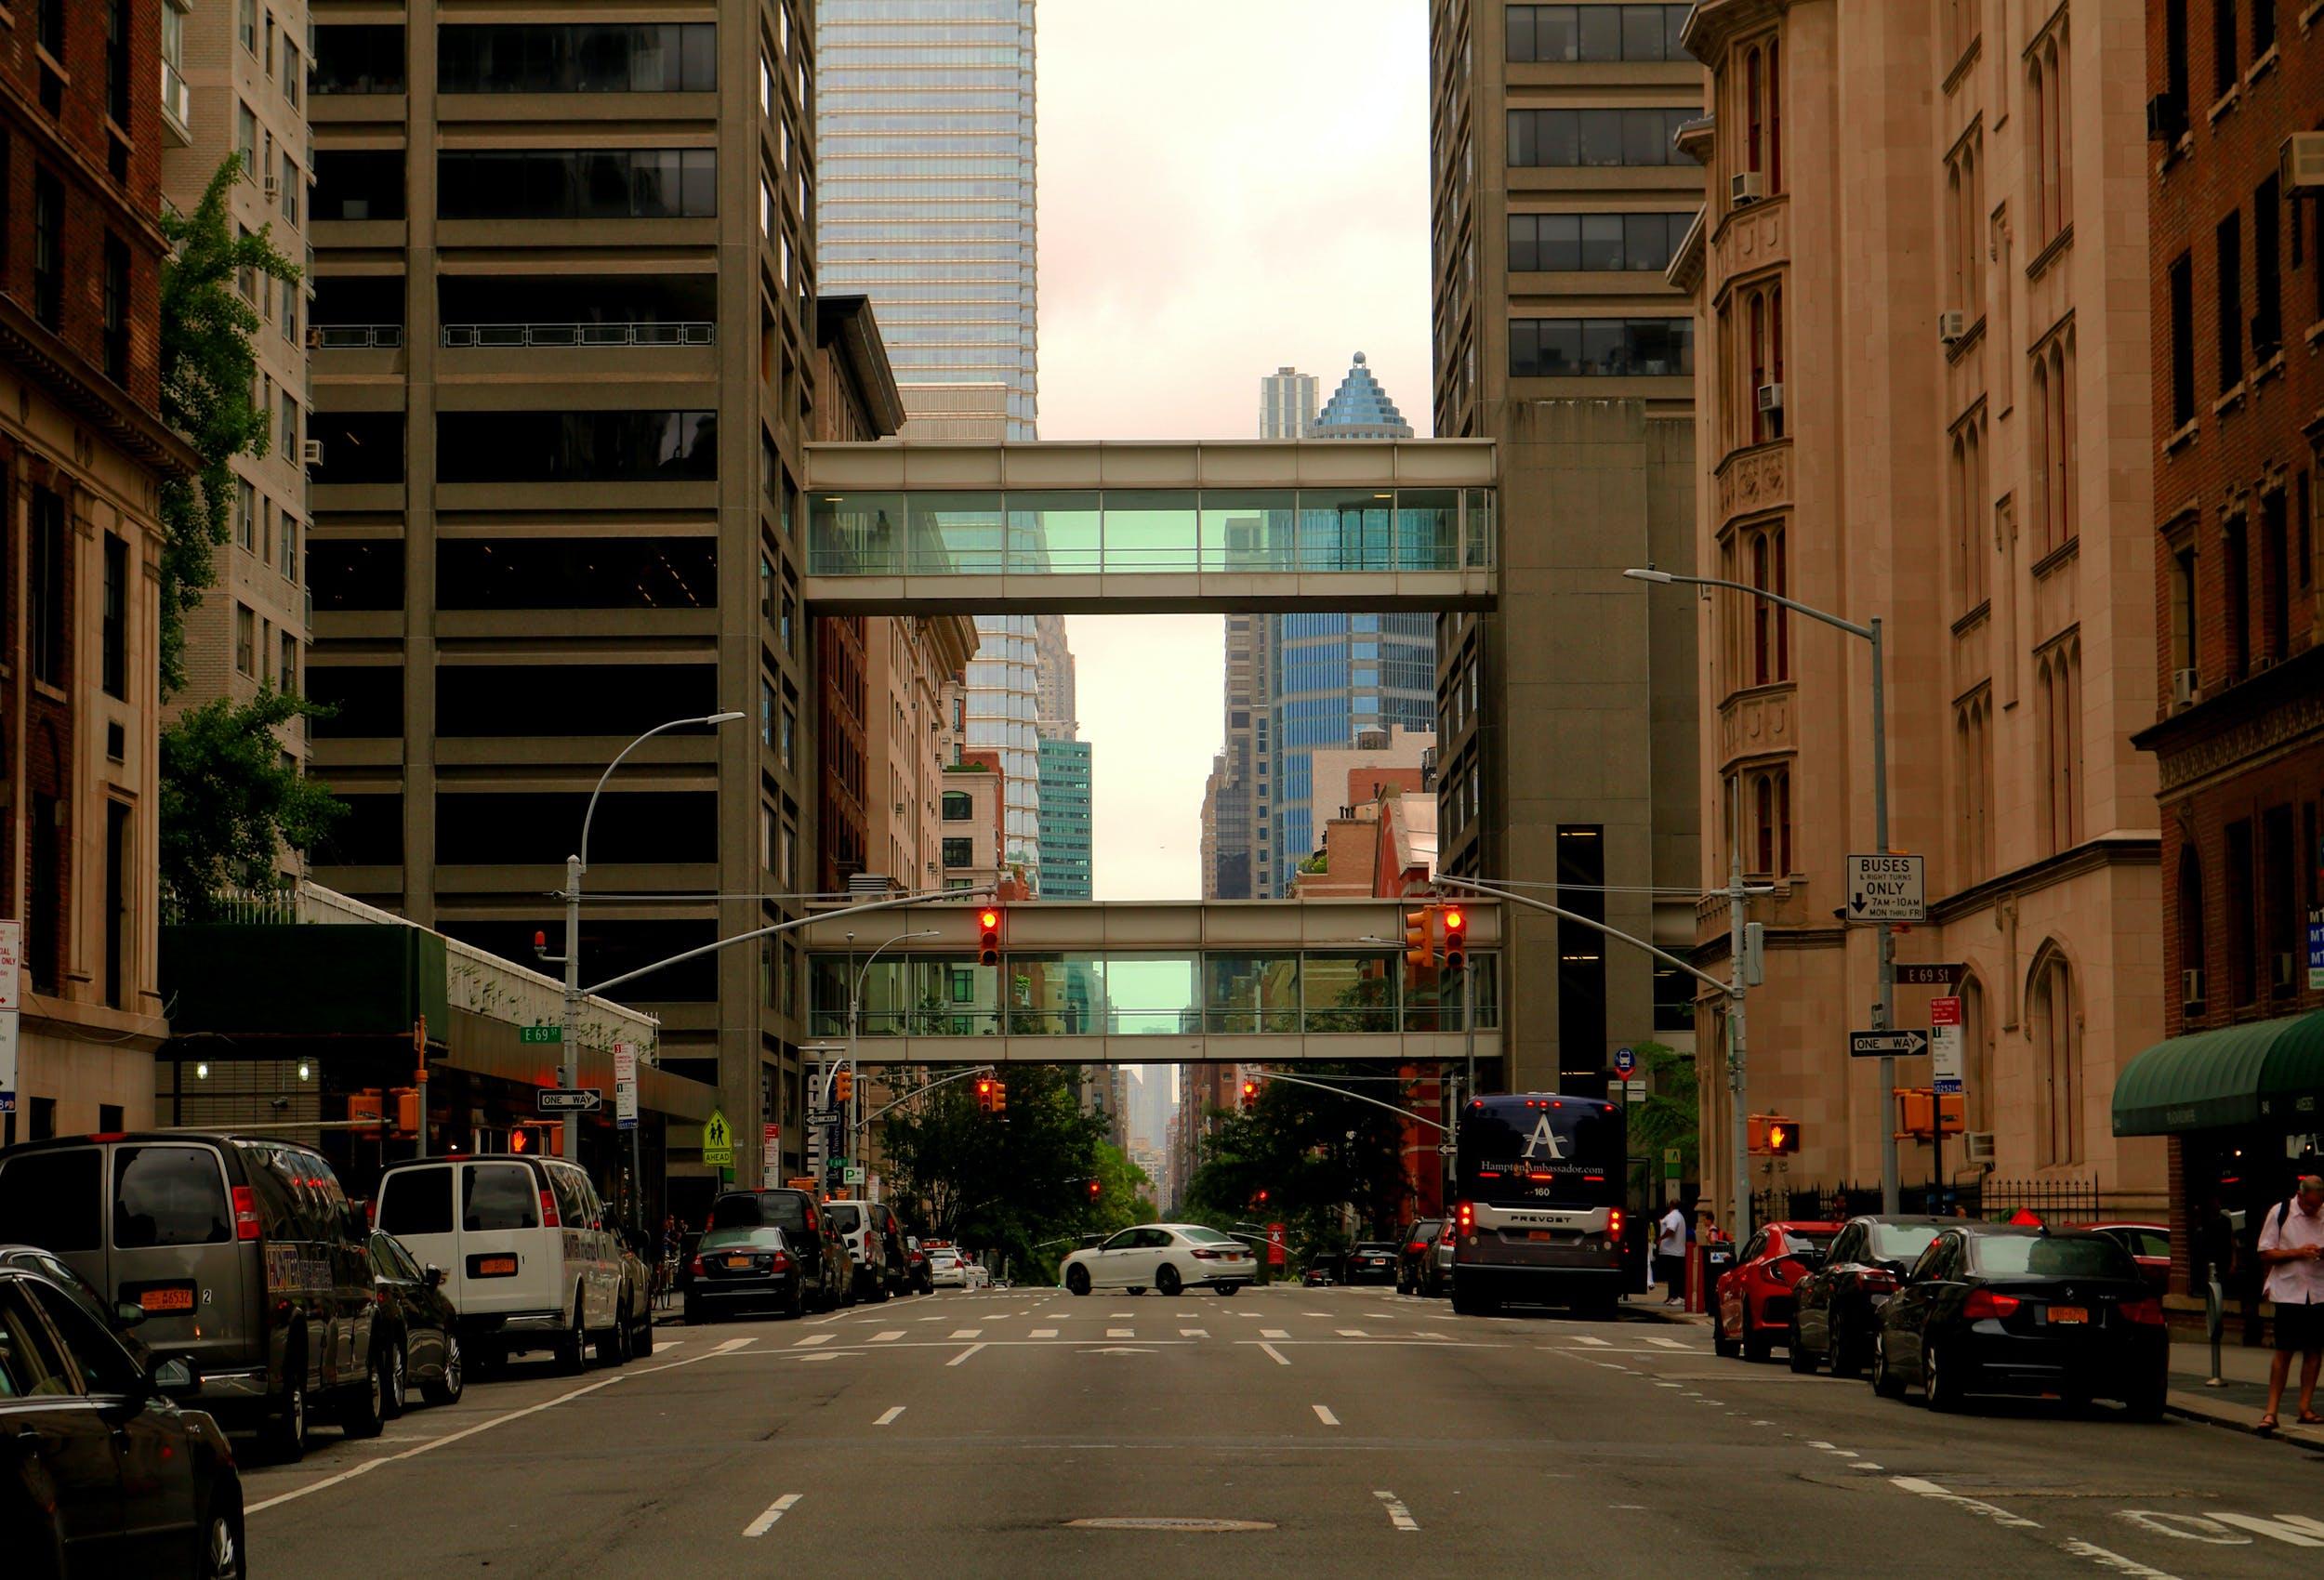 Free stock photo of #big city, #city streets, #Cityscape, #manhattan